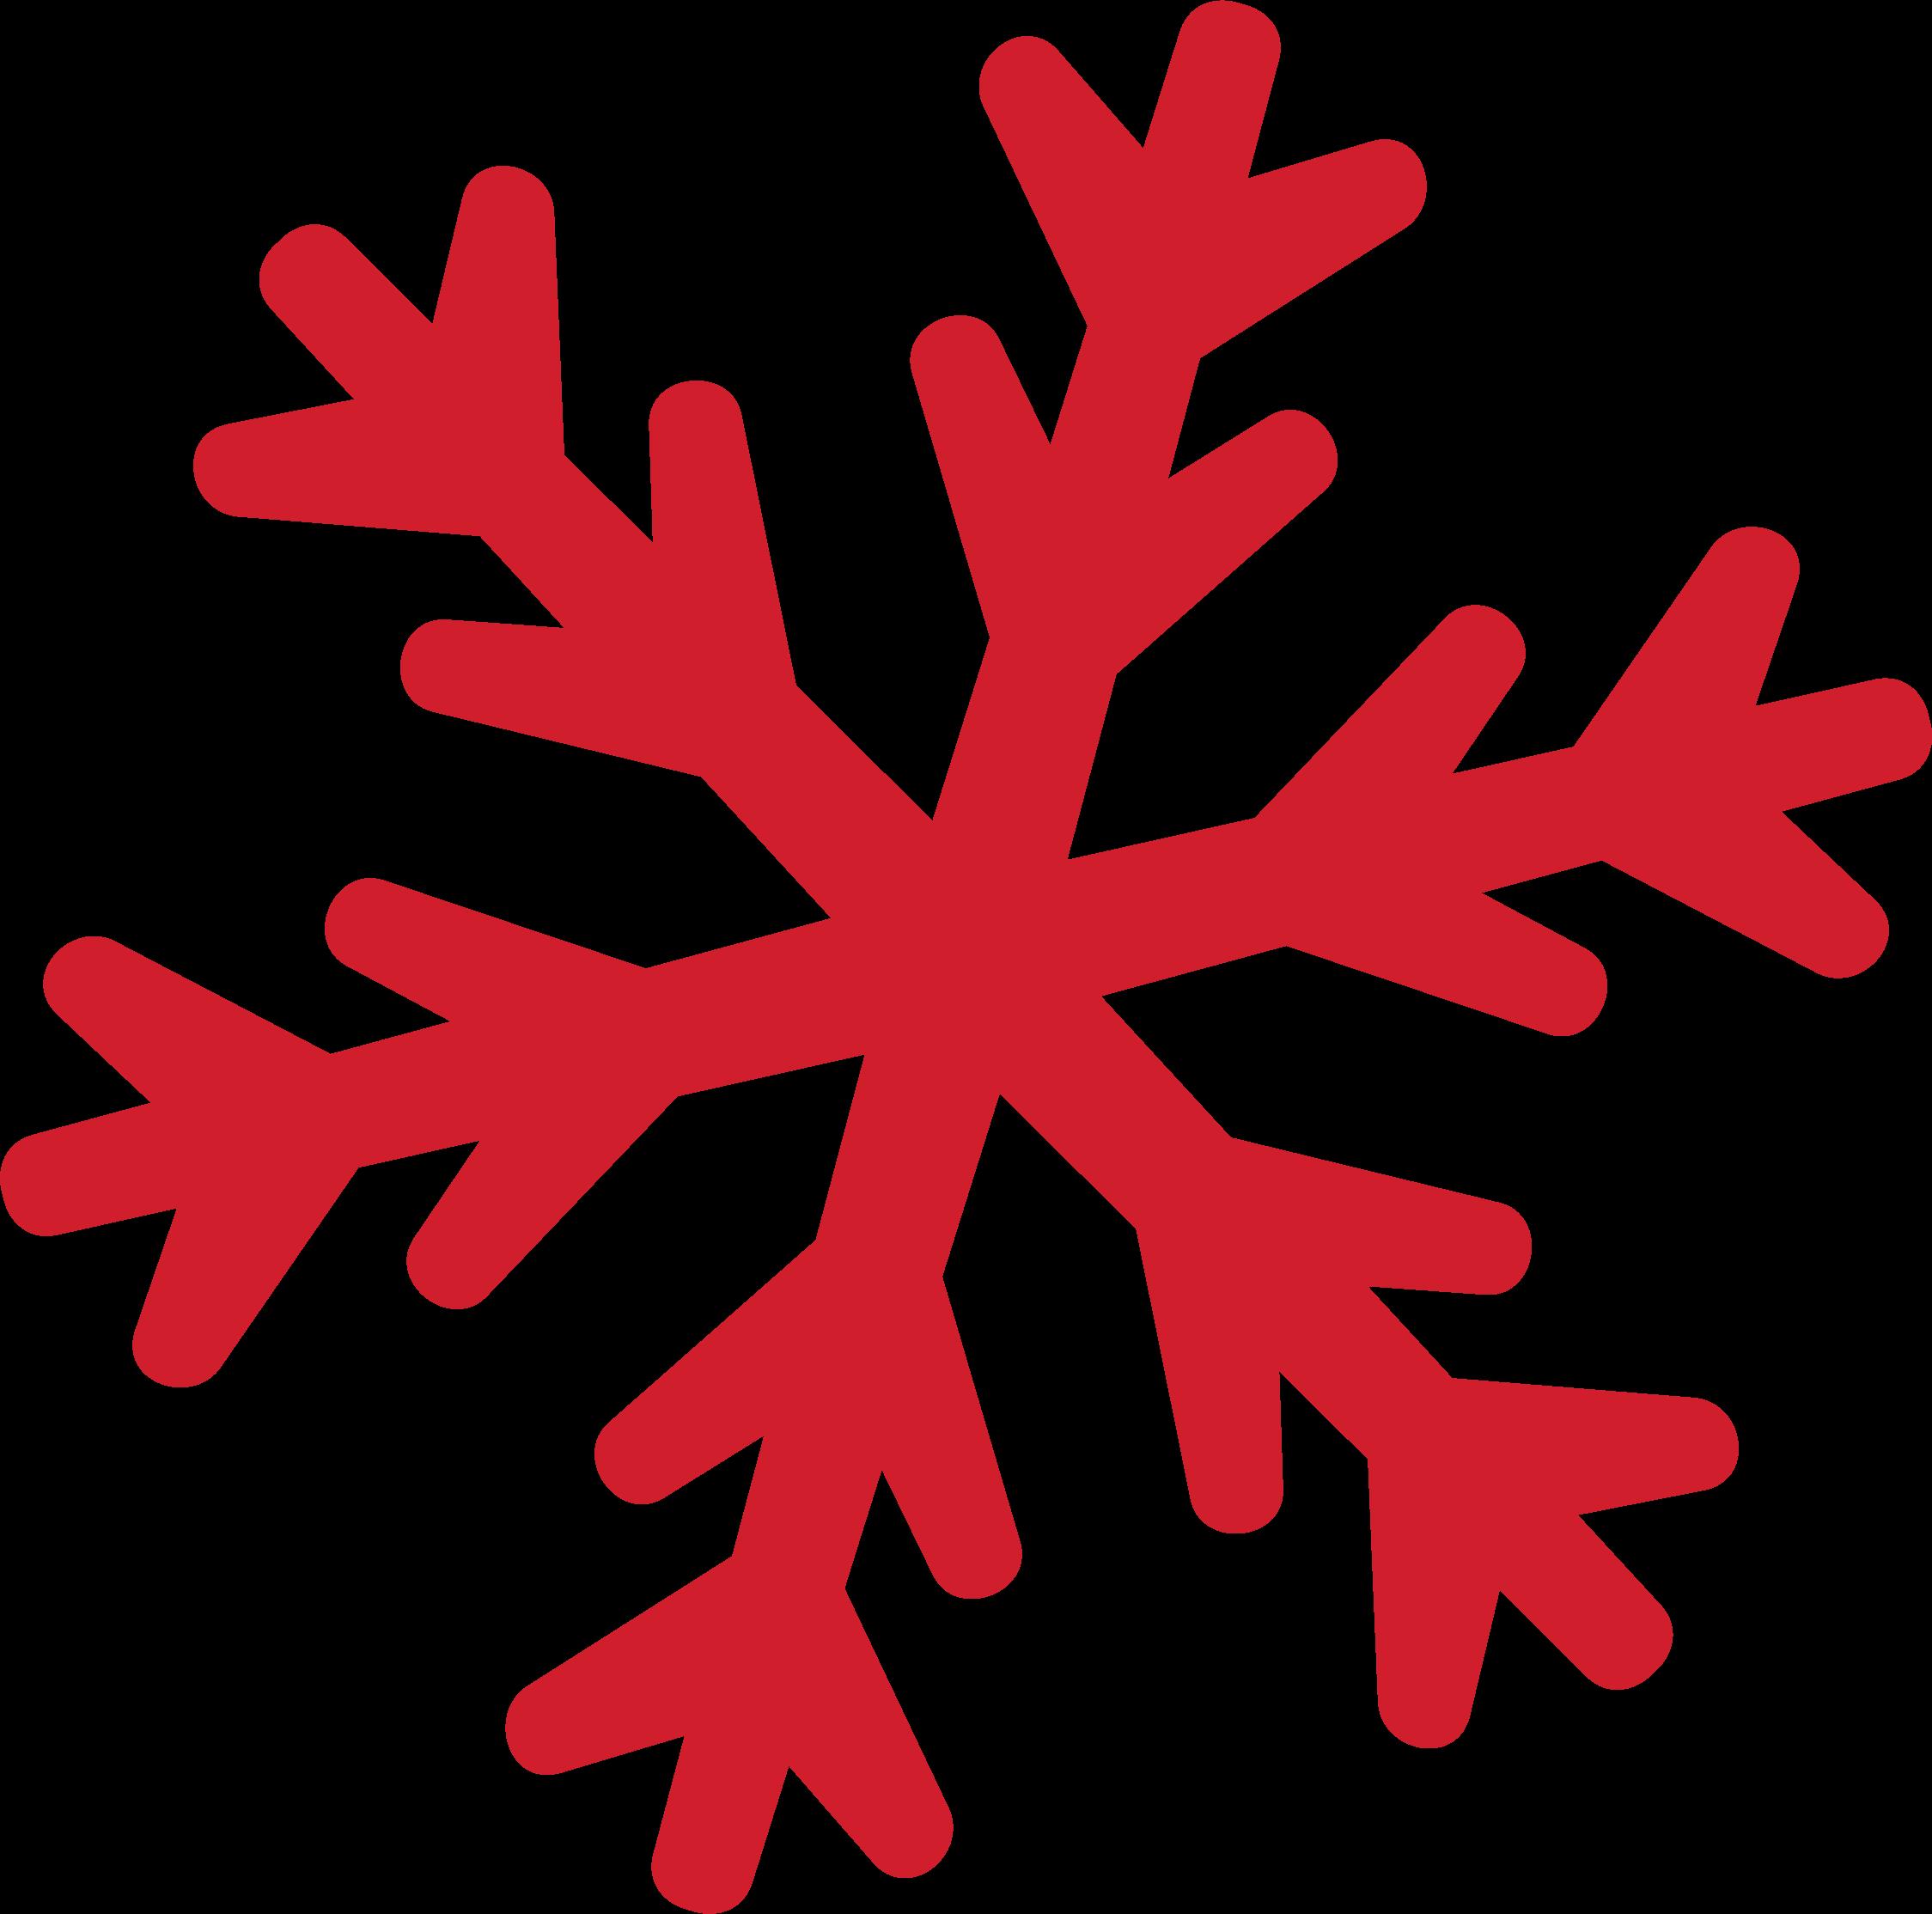 My Favorite Christmas Snowflake #2 SVG Cut File